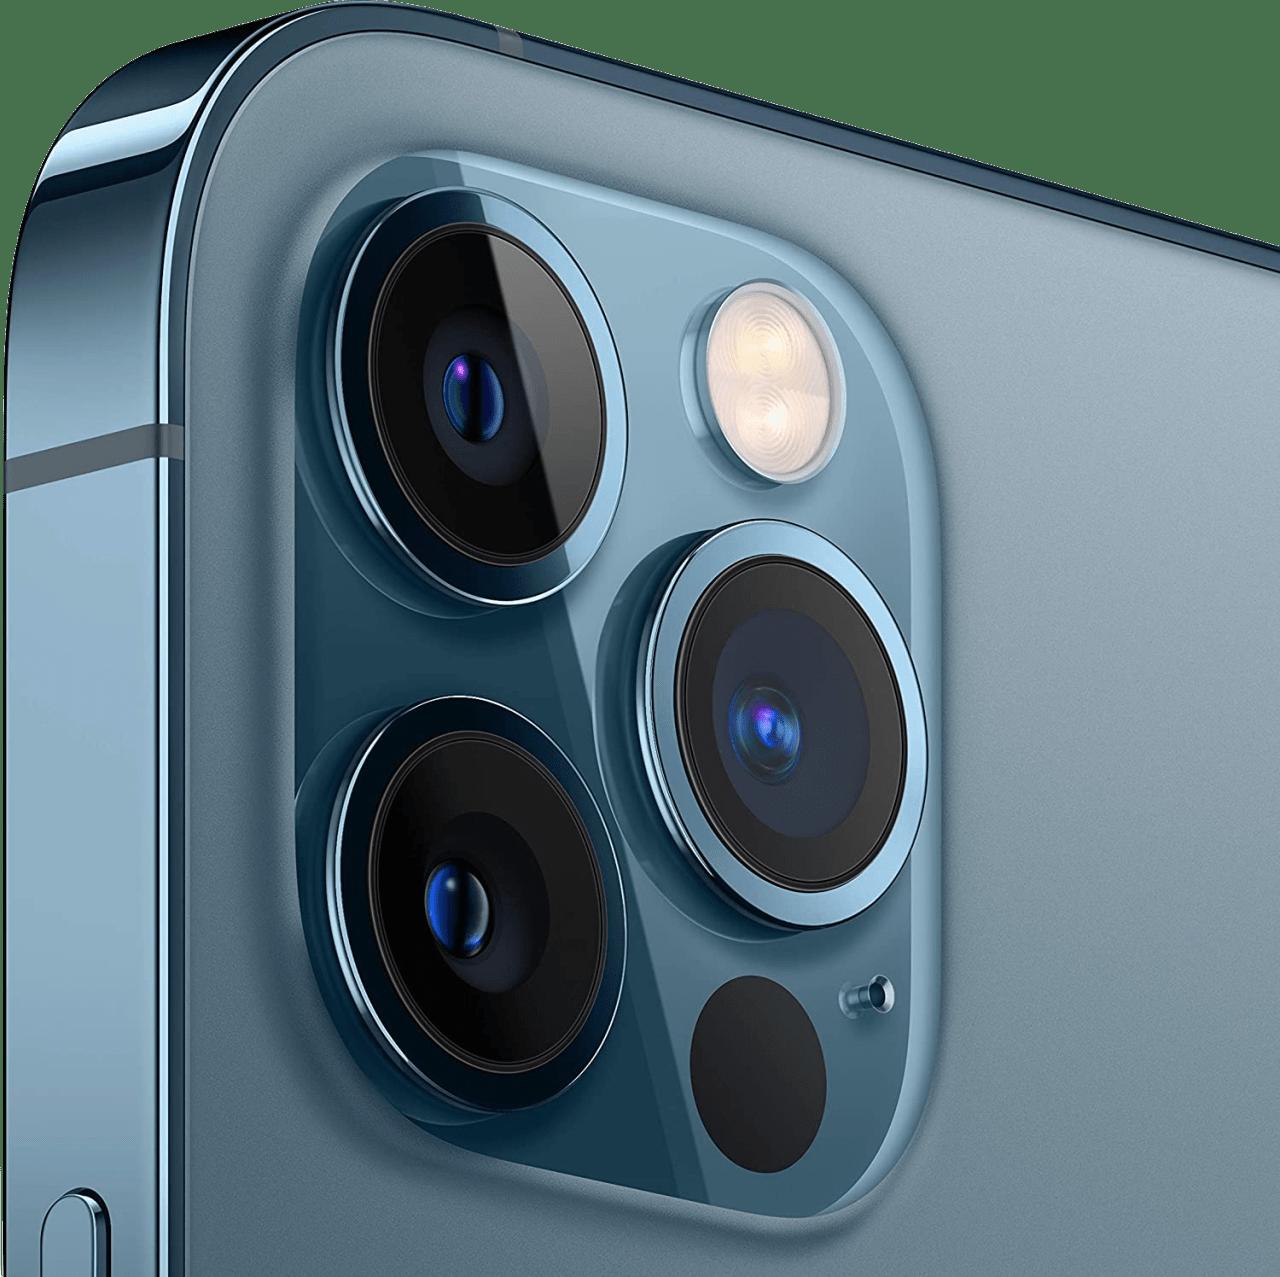 Pacific Blue Apple iPhone 12 Pro Max - 128GB - Dual Sim.4